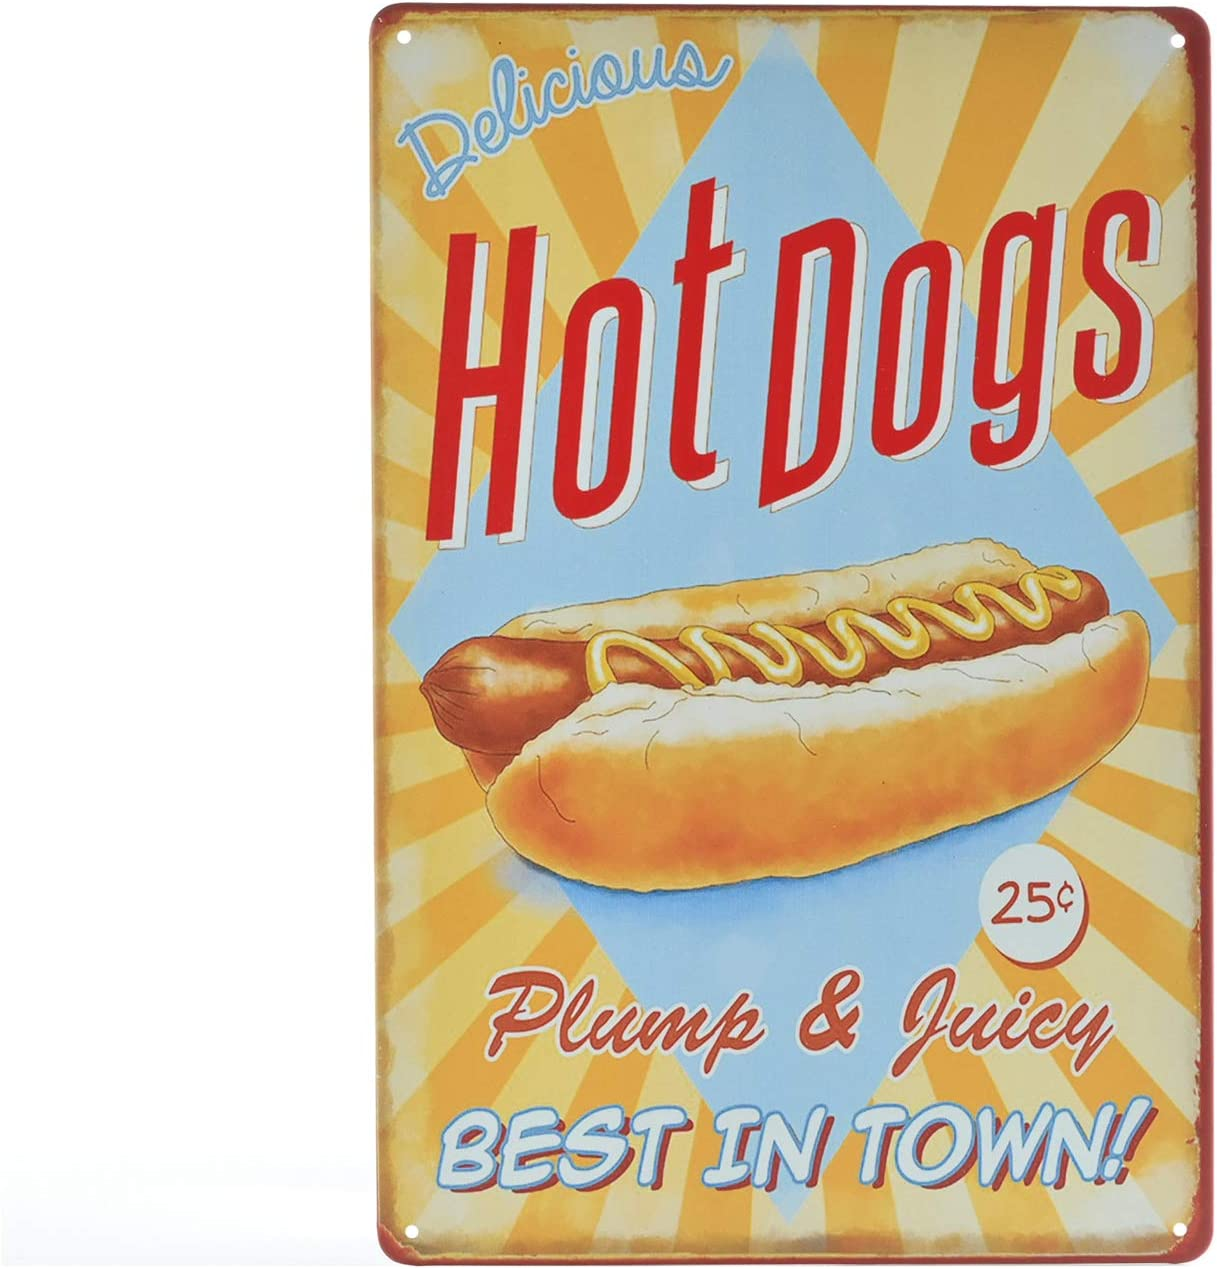 TREEPERI Vintage Metel Sign Fast Food Shop Retro Tin Decorative Sign Wall Decor Prints - Hotdogs